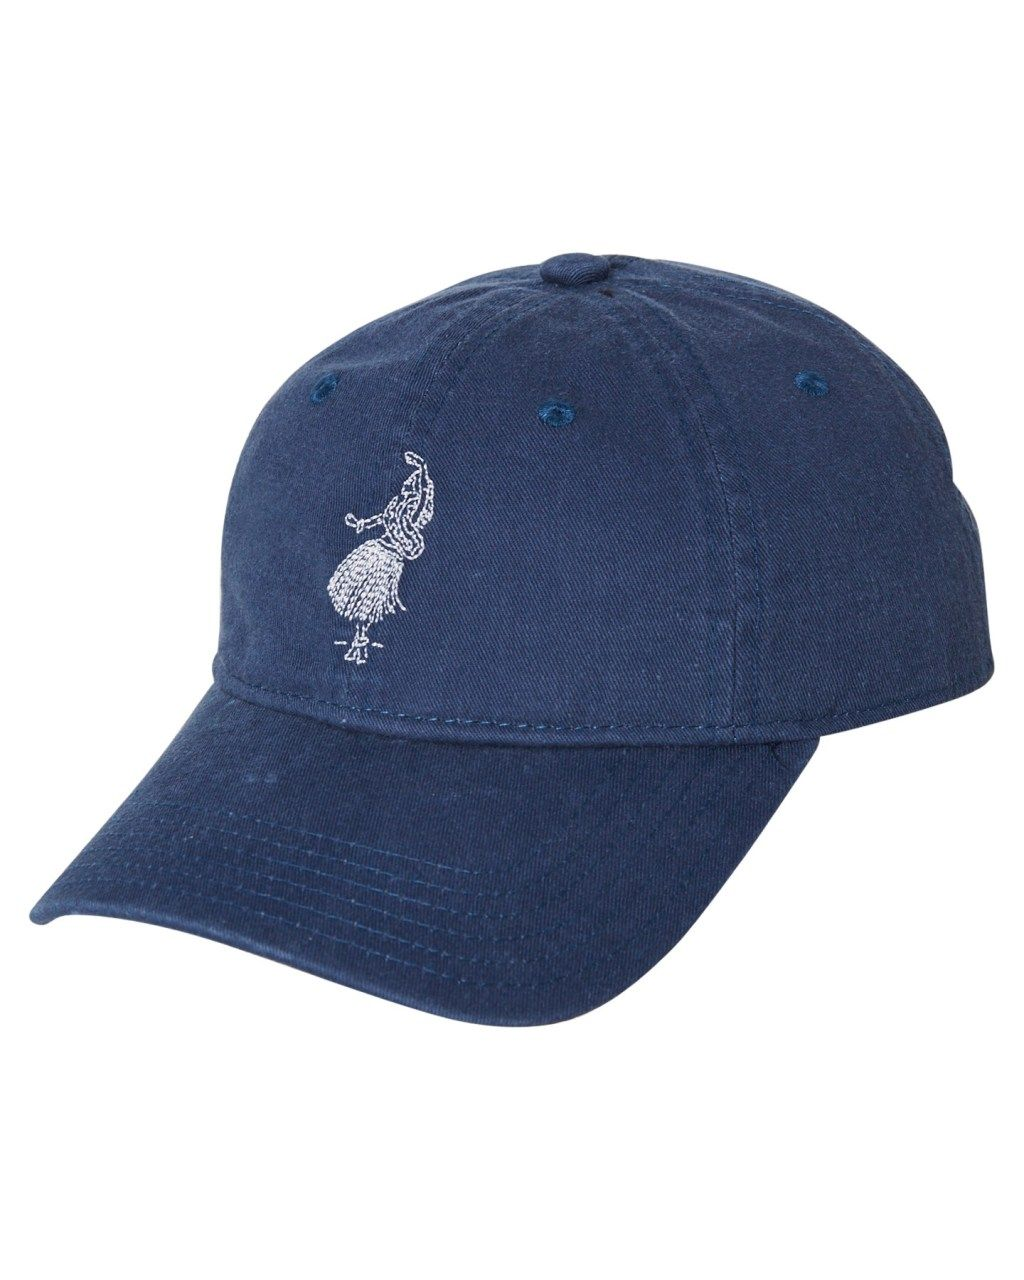 b793762718cb6 Rhythm Hula Strapback Cap Vintage Navy Vintage Navy Mens Accessories Other  Size